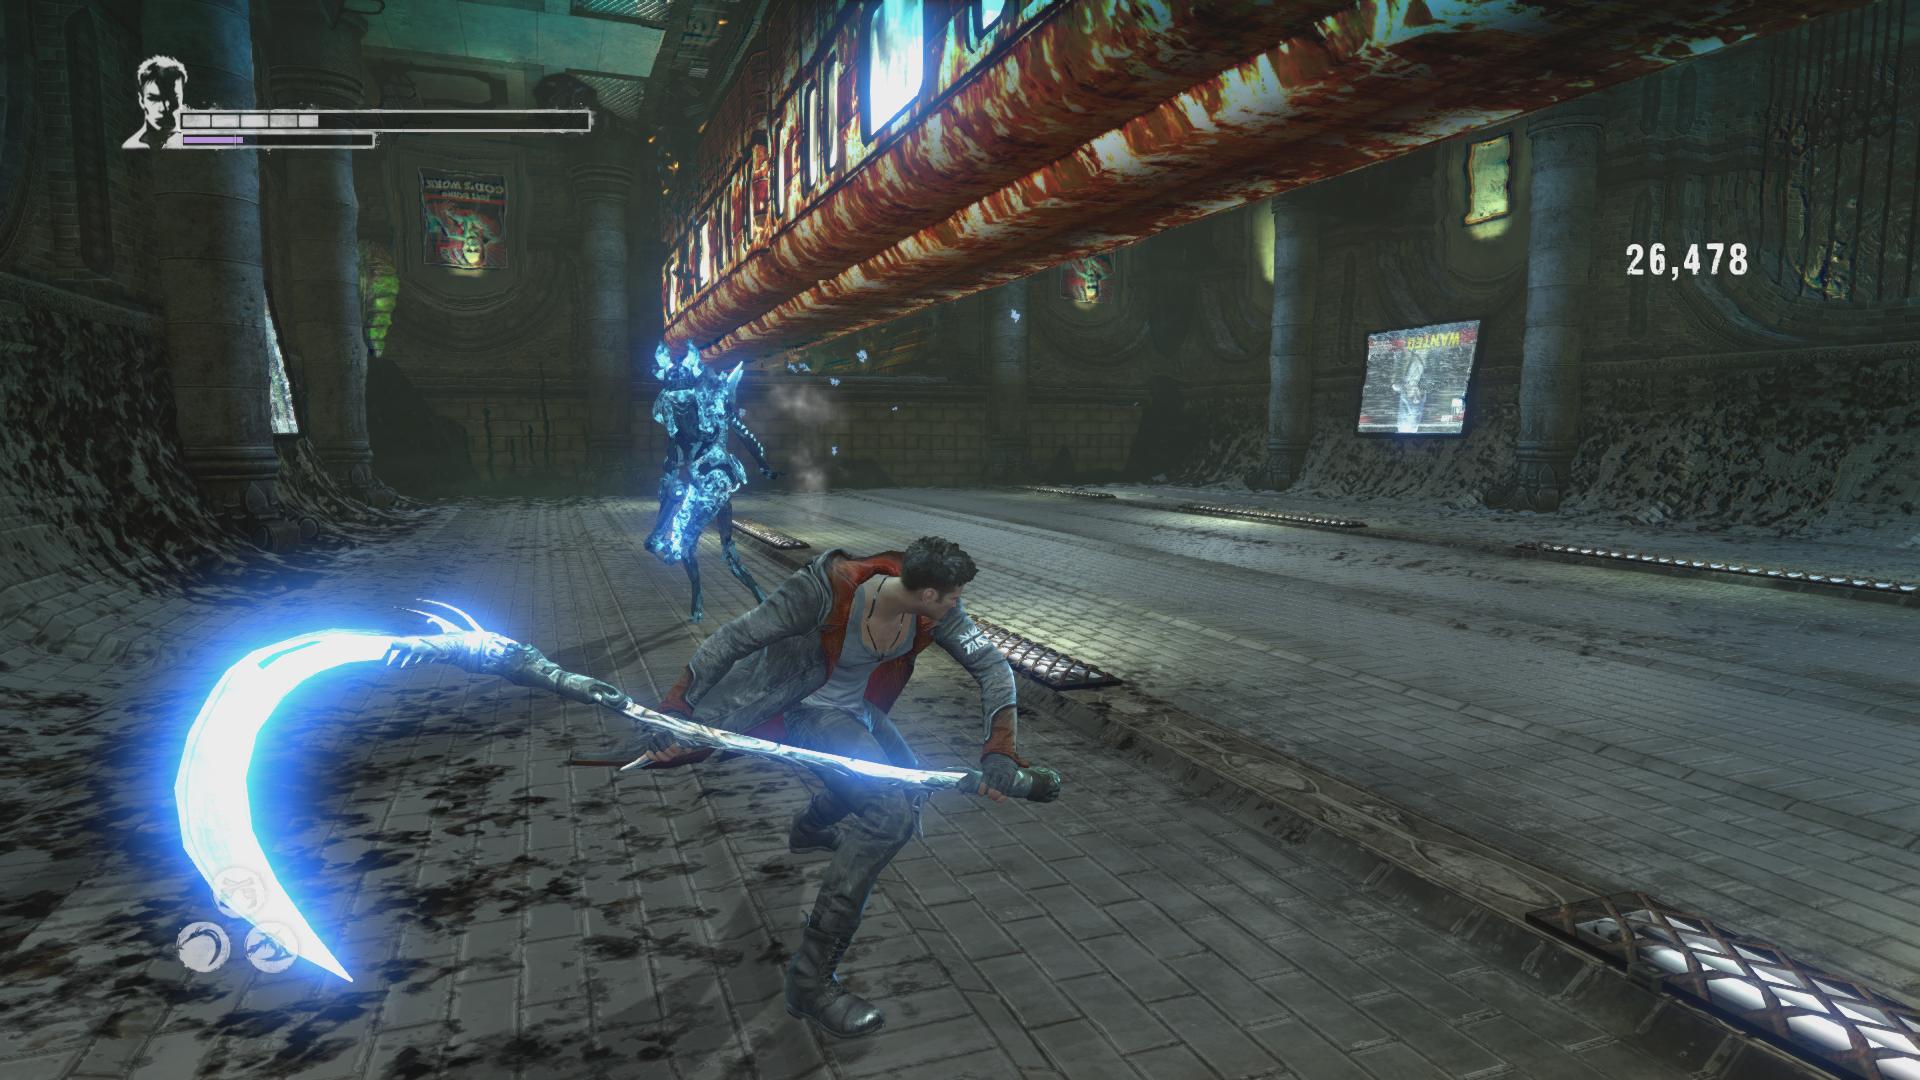 Confira as novas imagens de DMC: Definitive Edition para PS4 e Xbox One